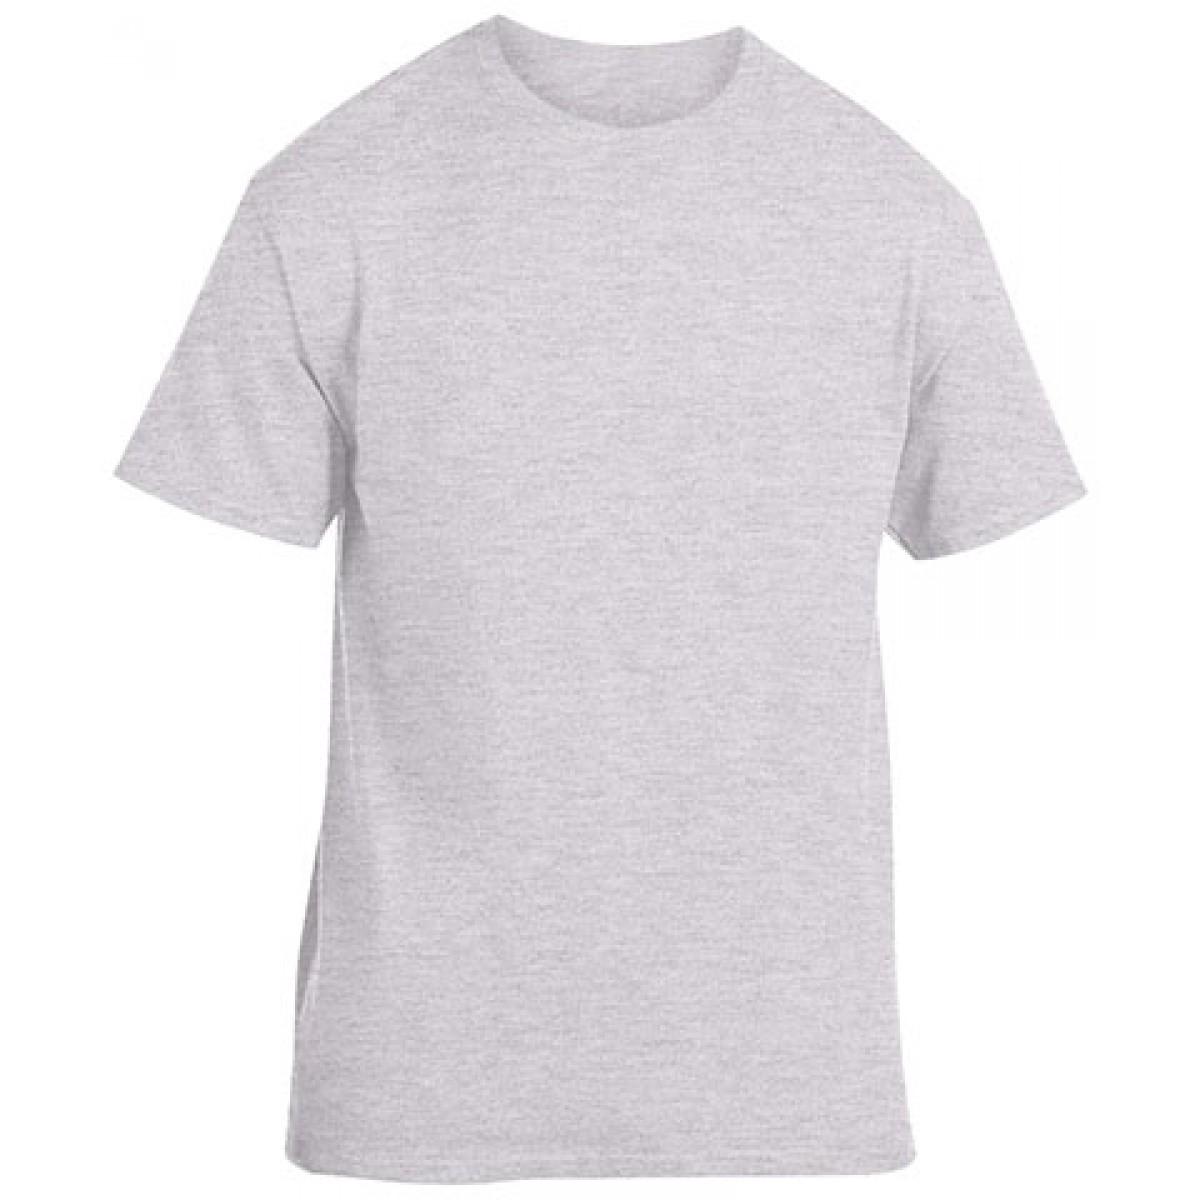 Cotton Short Sleeve T-Shirt-Sports Grey-YL